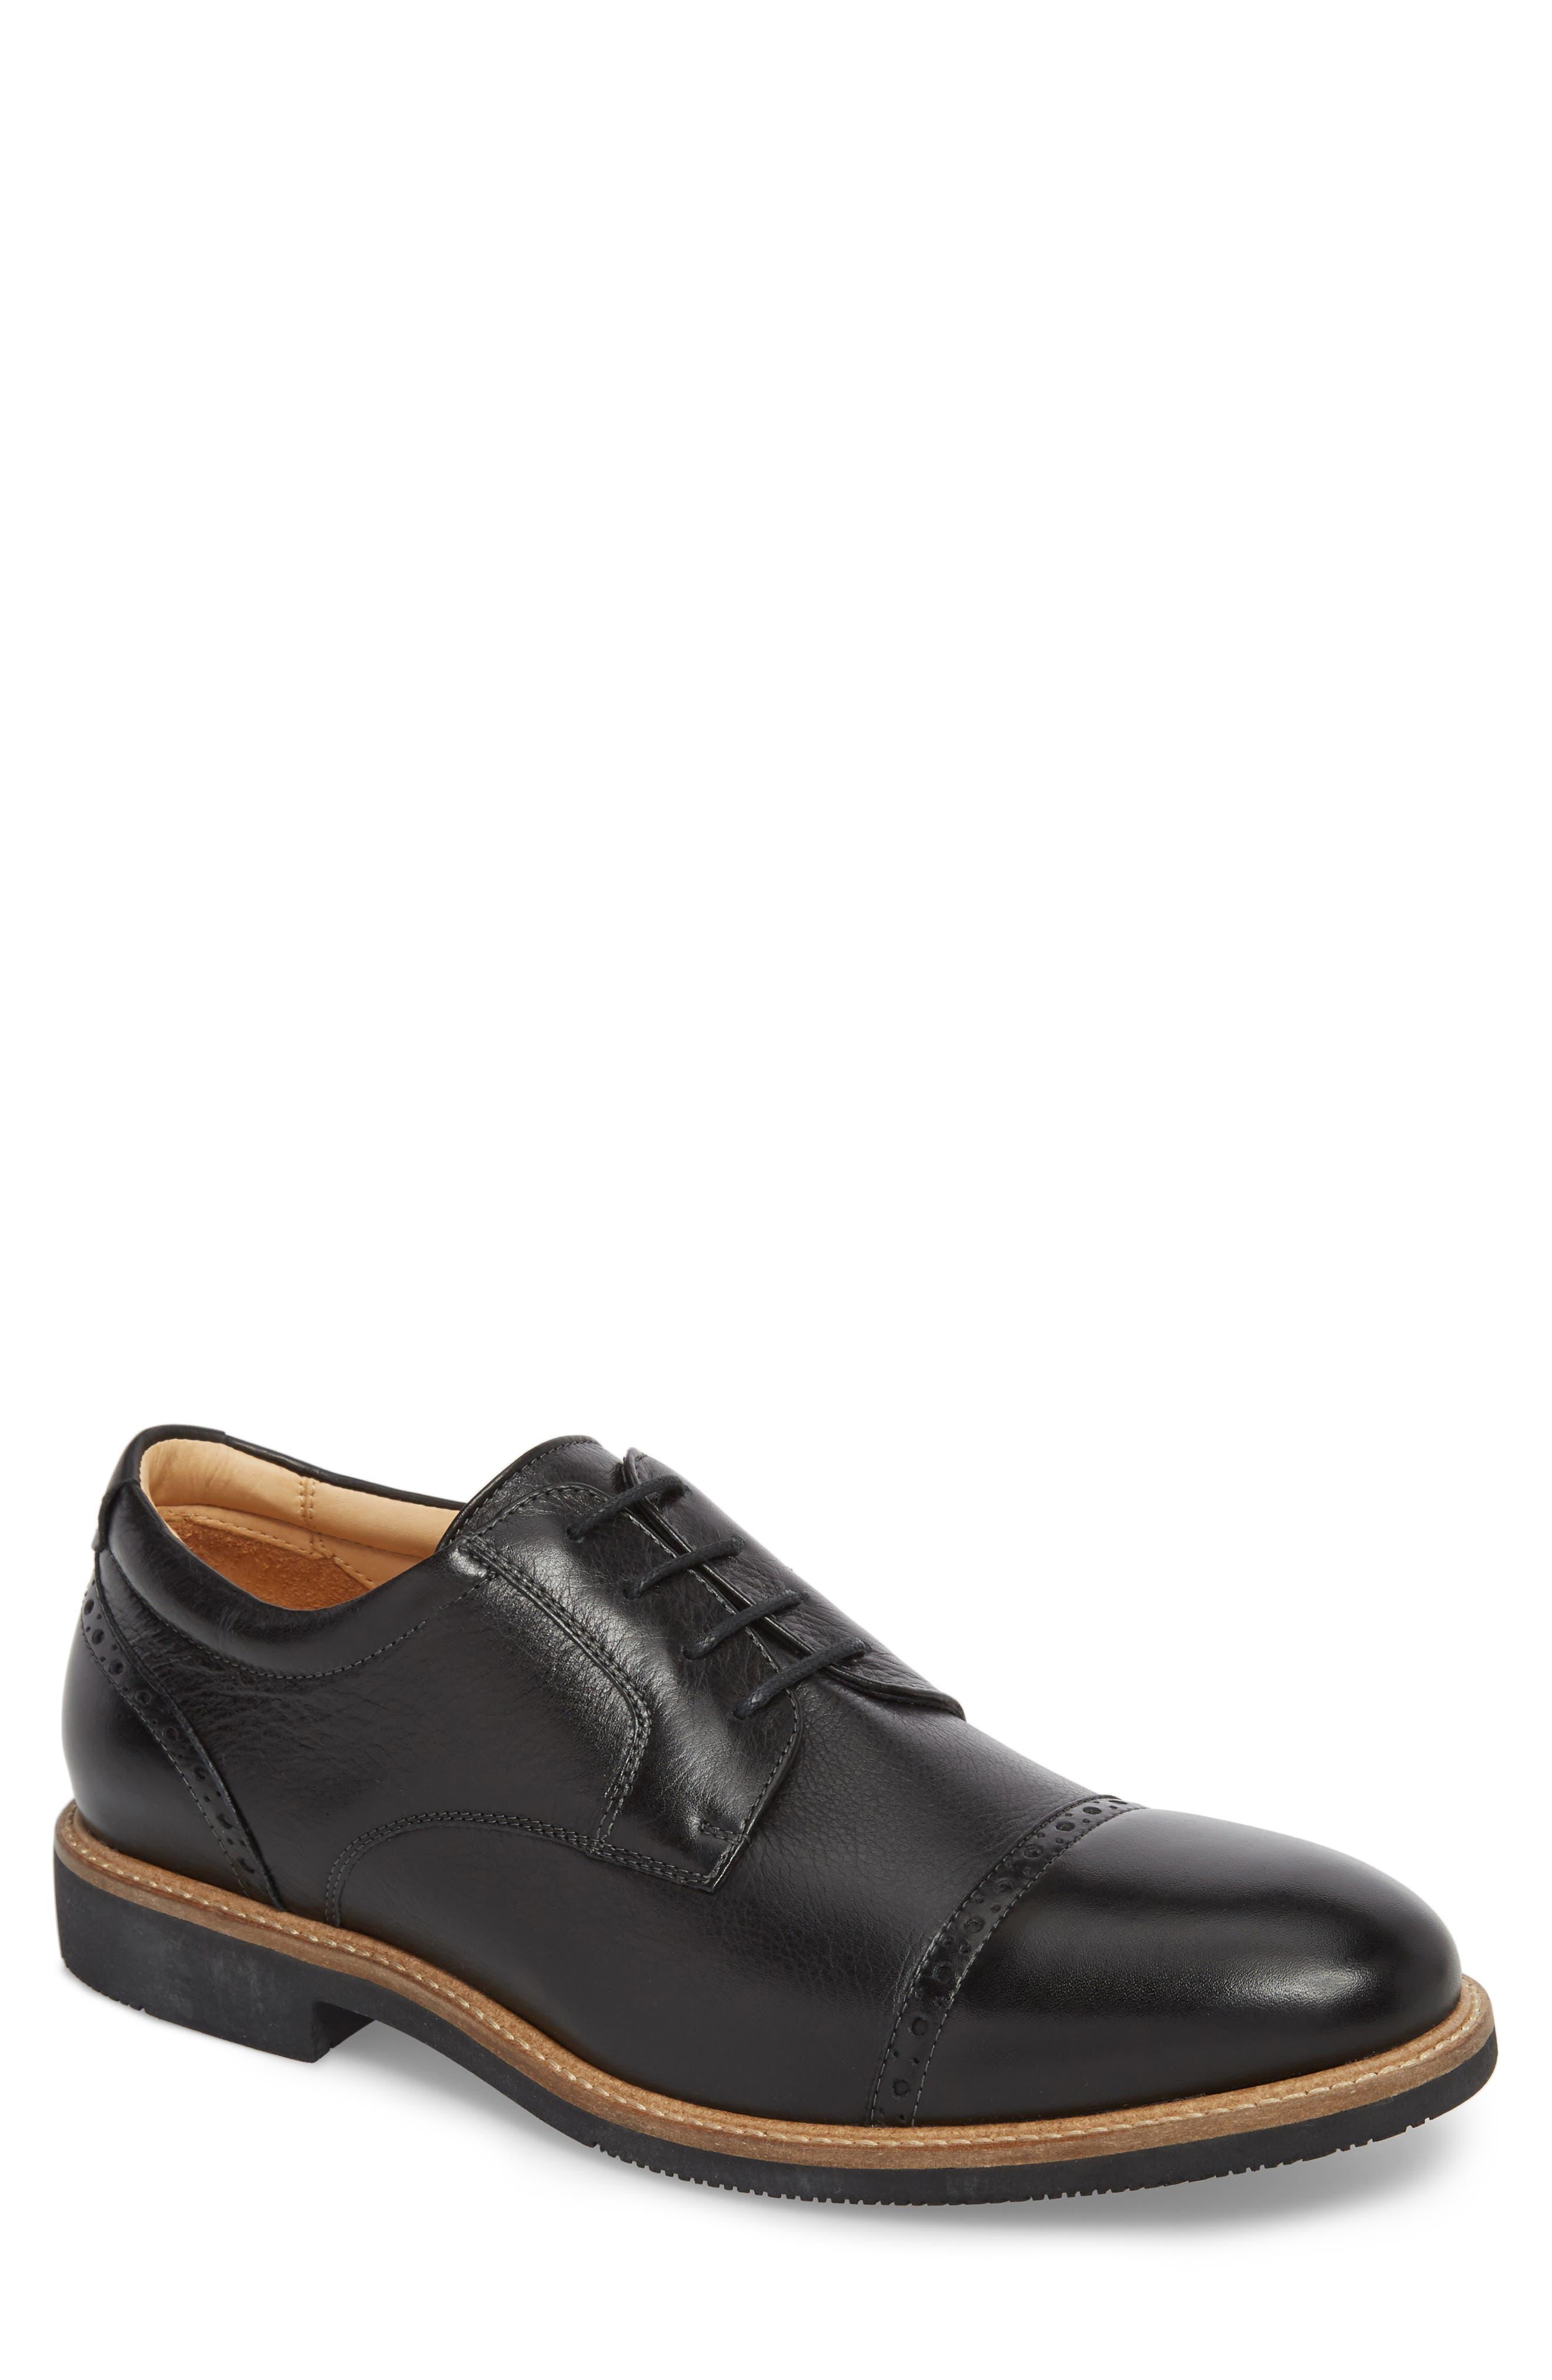 Barlow Cap Toe Derby,                         Main,                         color, Black Leather